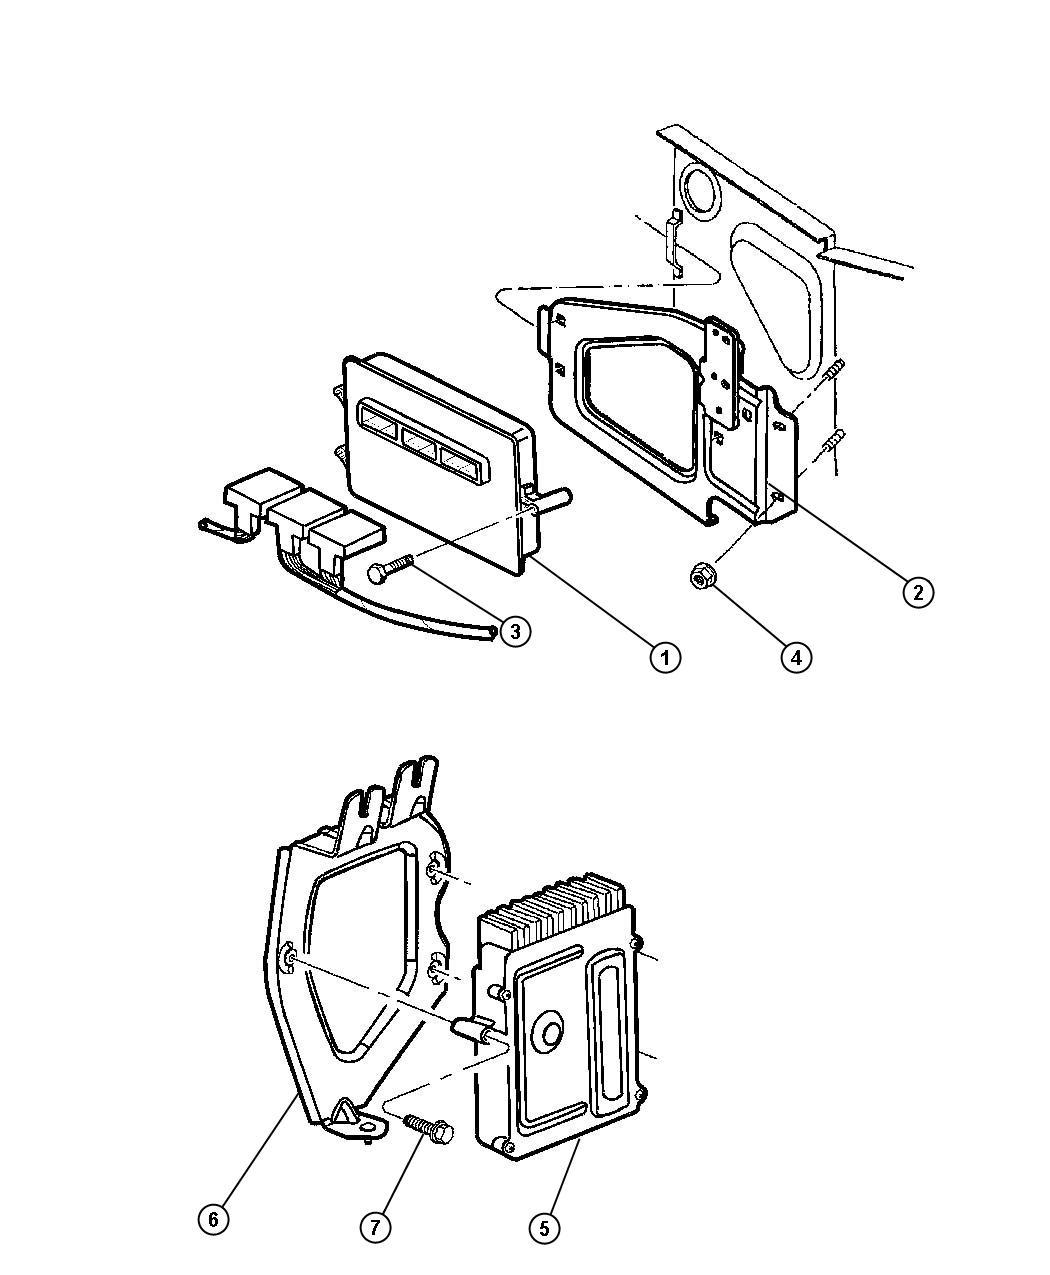 r6044632ae jeep module powertrain control. Black Bedroom Furniture Sets. Home Design Ideas